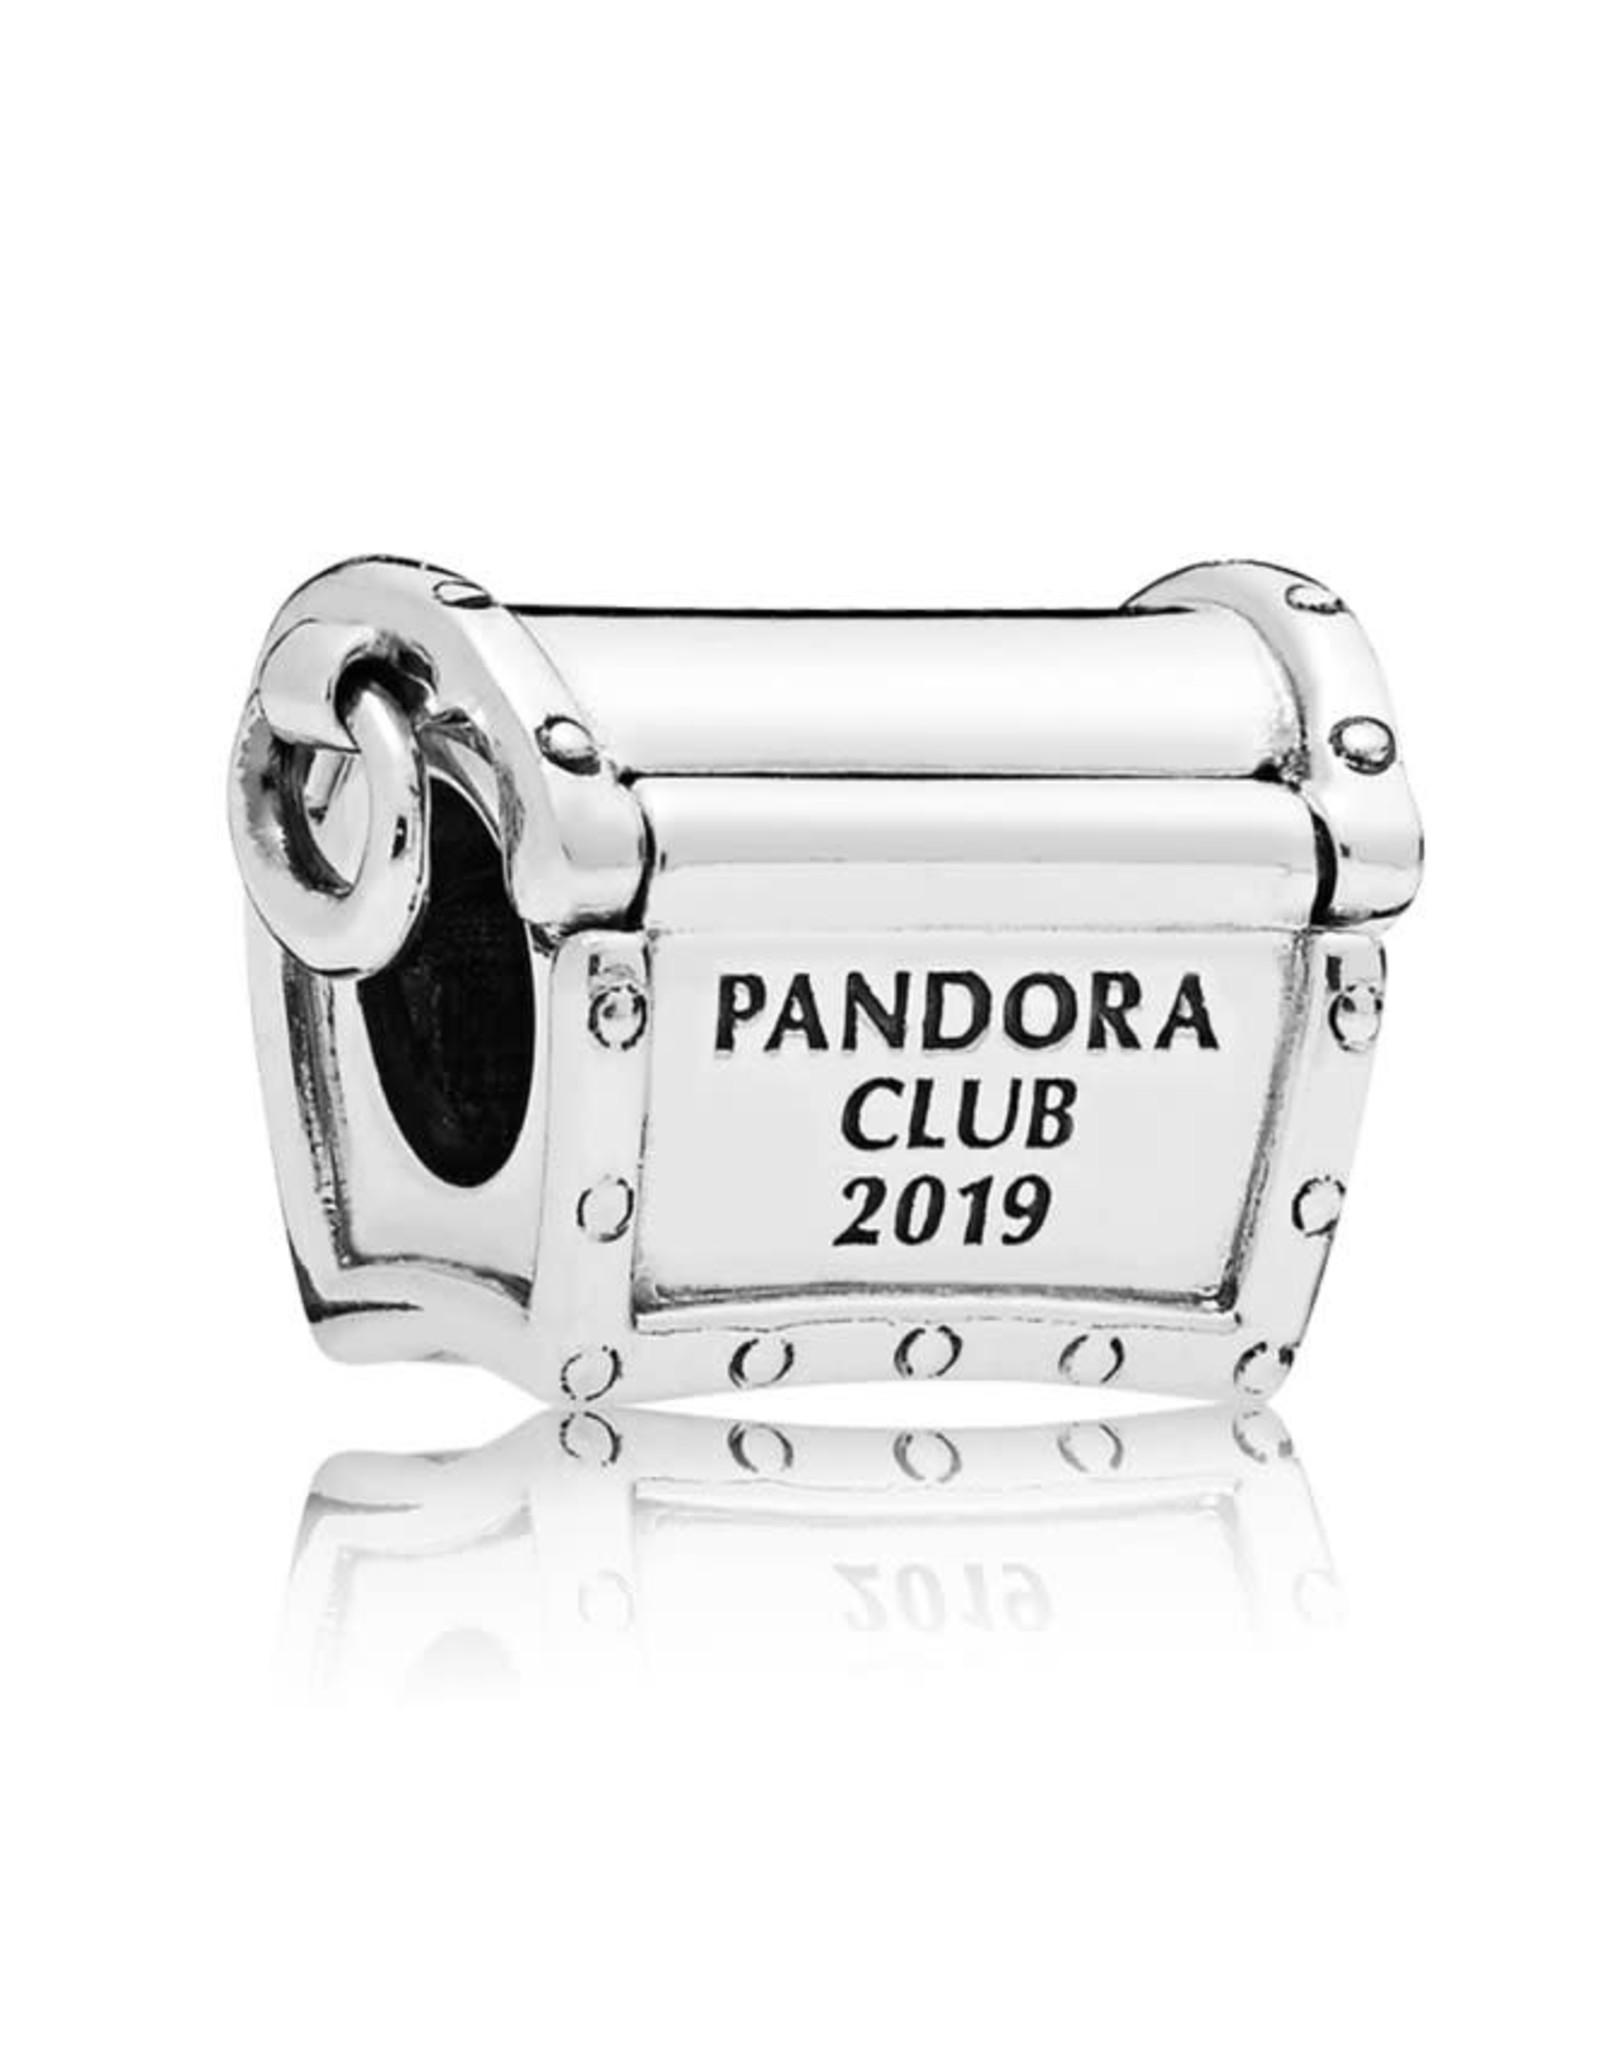 Pandora Pandora Charm 2019 Pandora Club